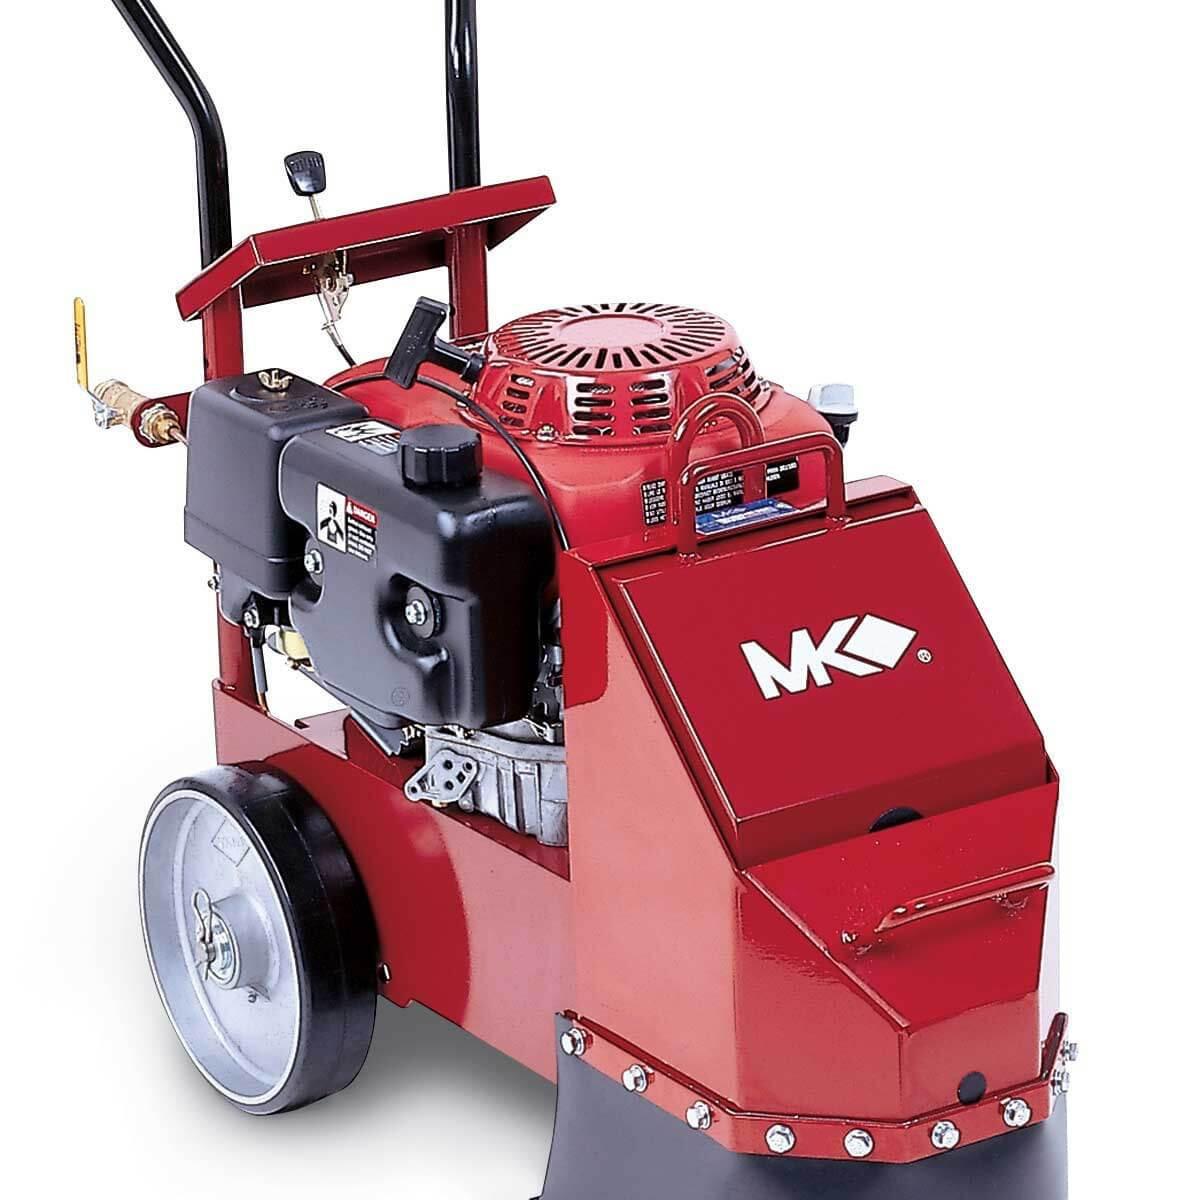 MK-SDG Floor Grinder Honda motor